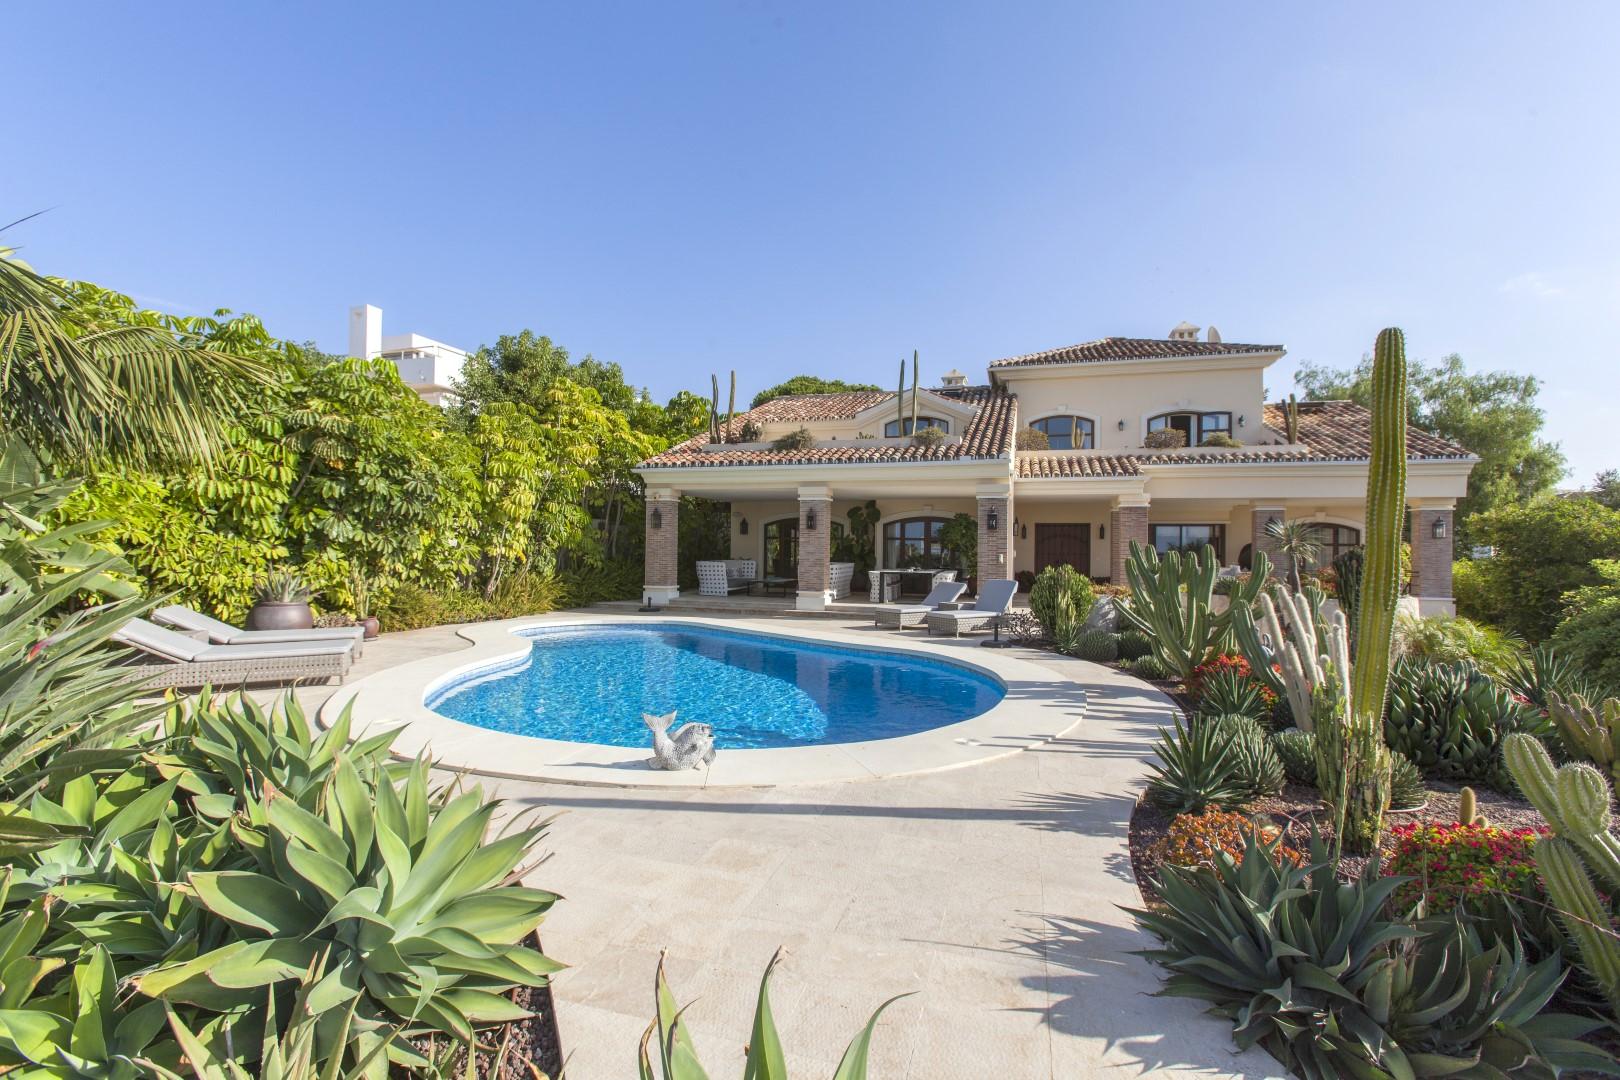 Elegant villa in Las Chapas 200m from beach. 2.700.000€